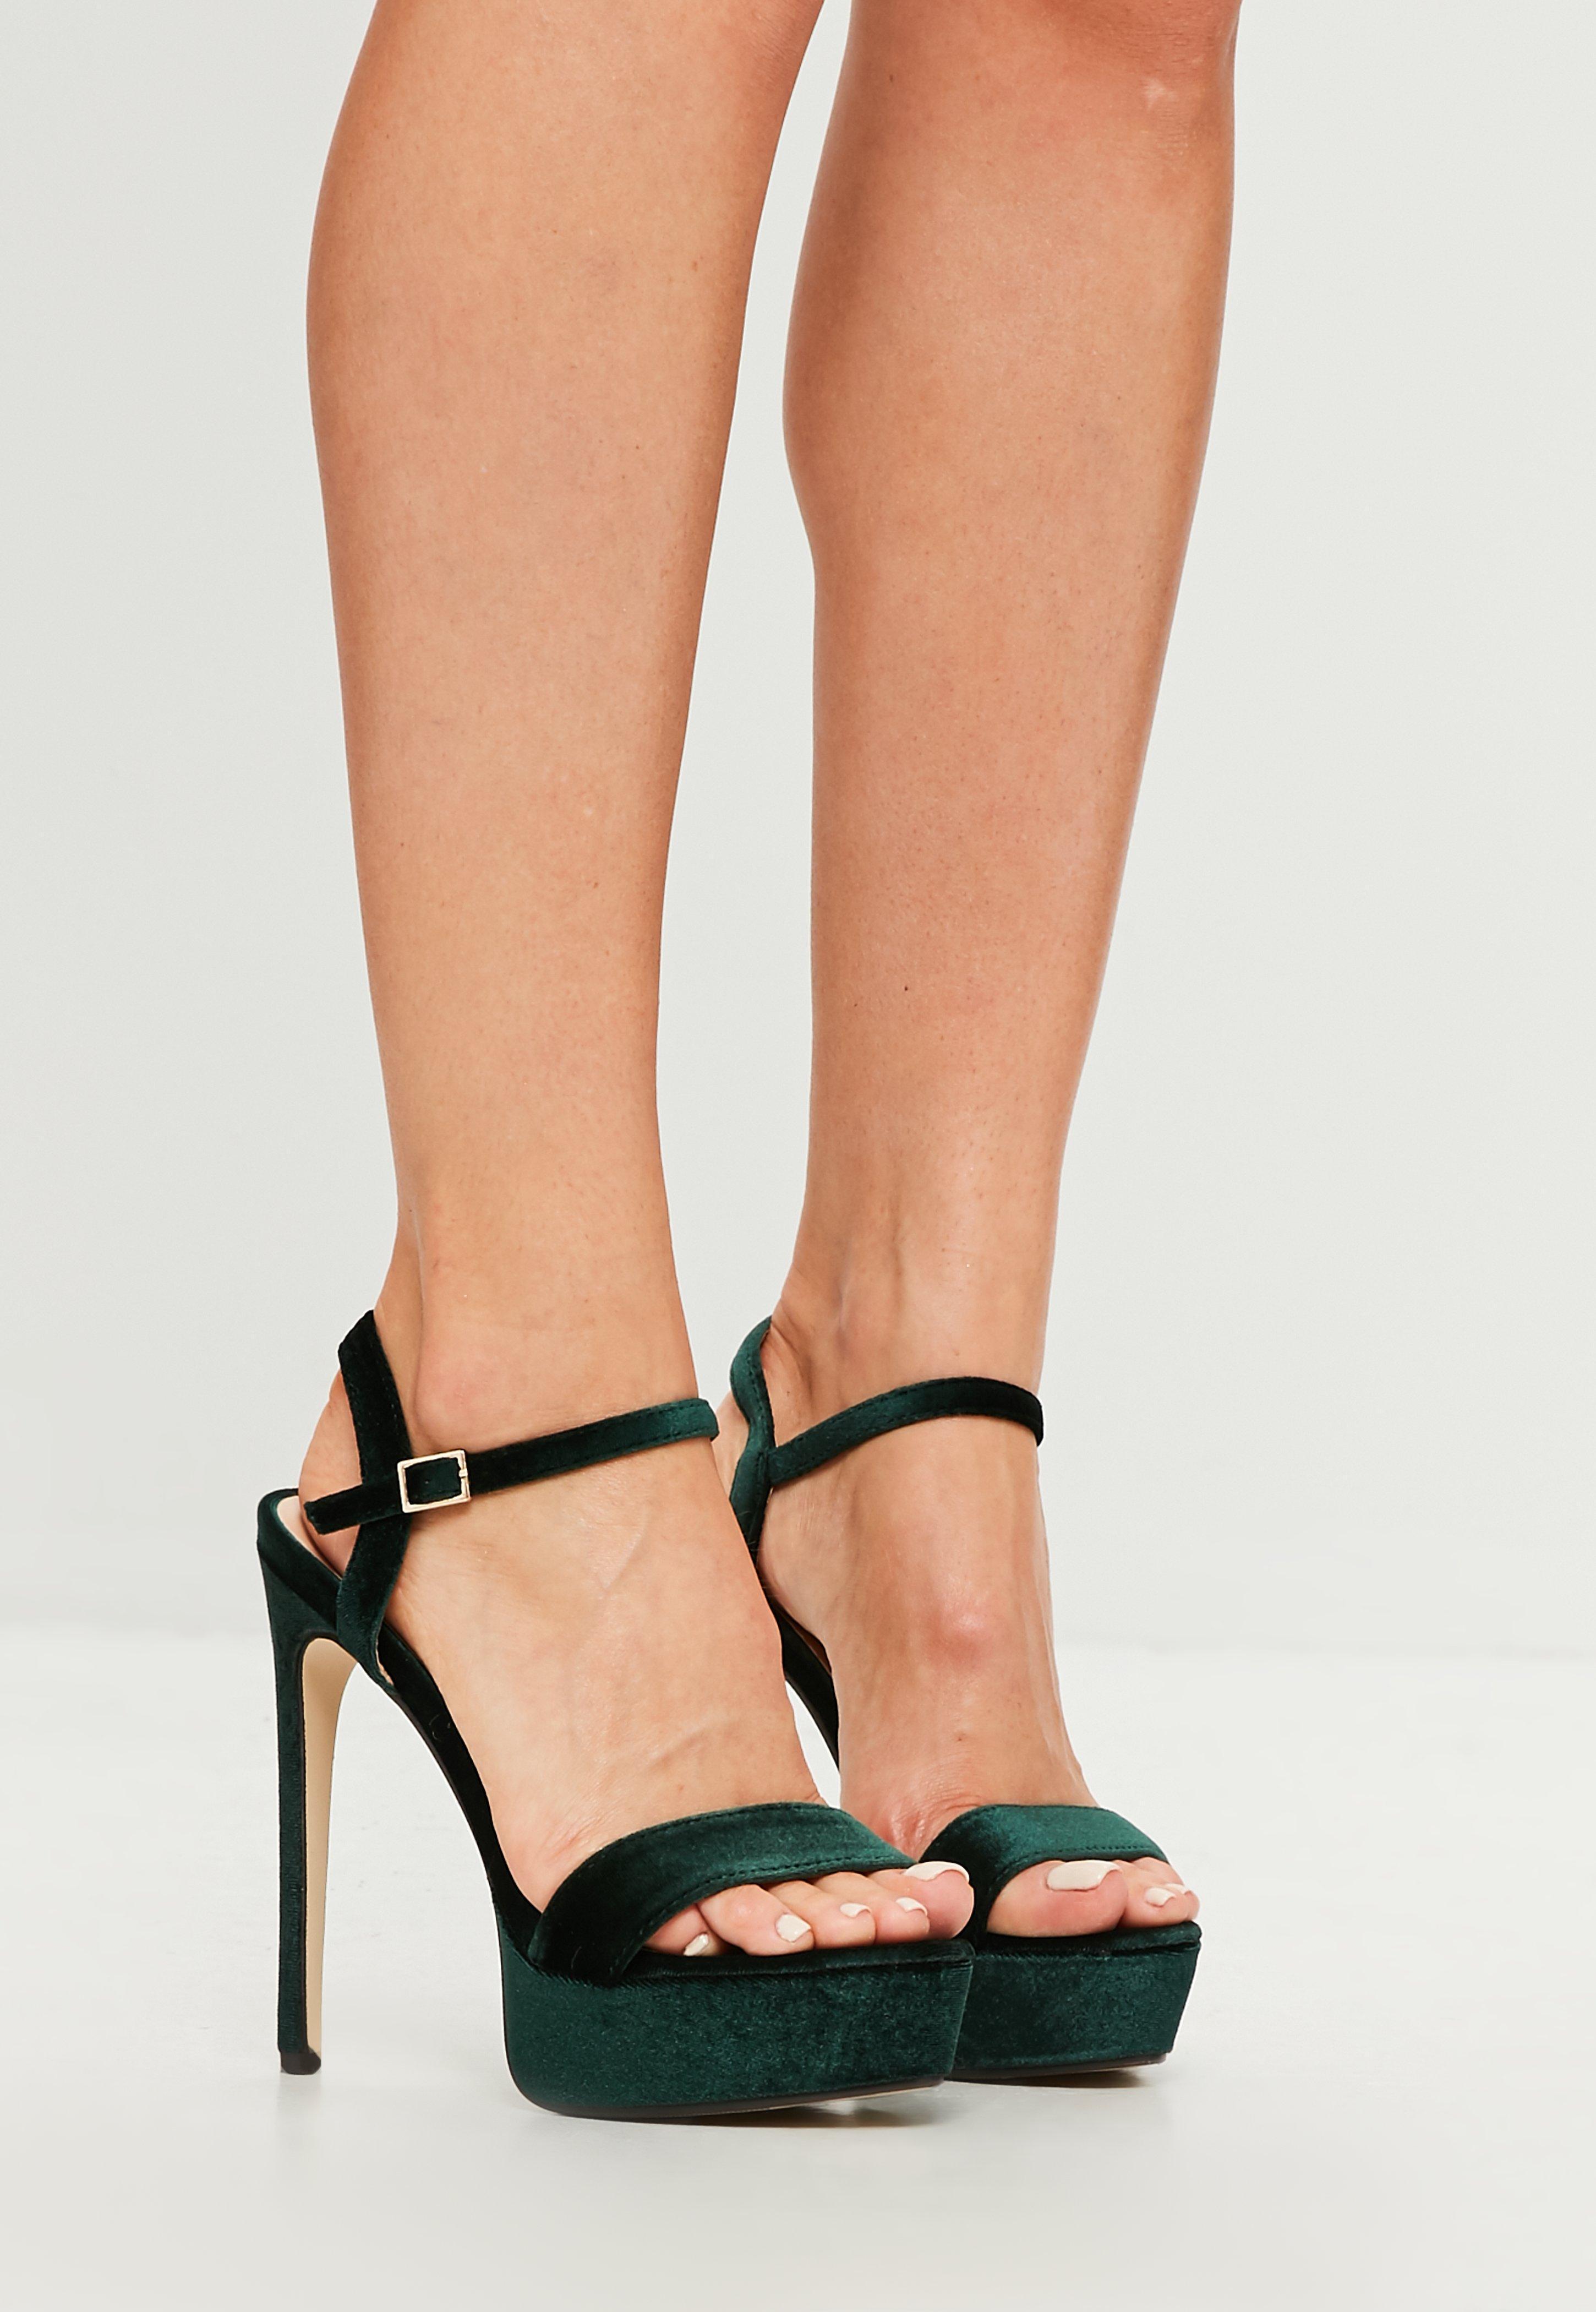 4a43f3c7de2 Lyst - Missguided Green Velvet Two Strap Platform Sandals in Green